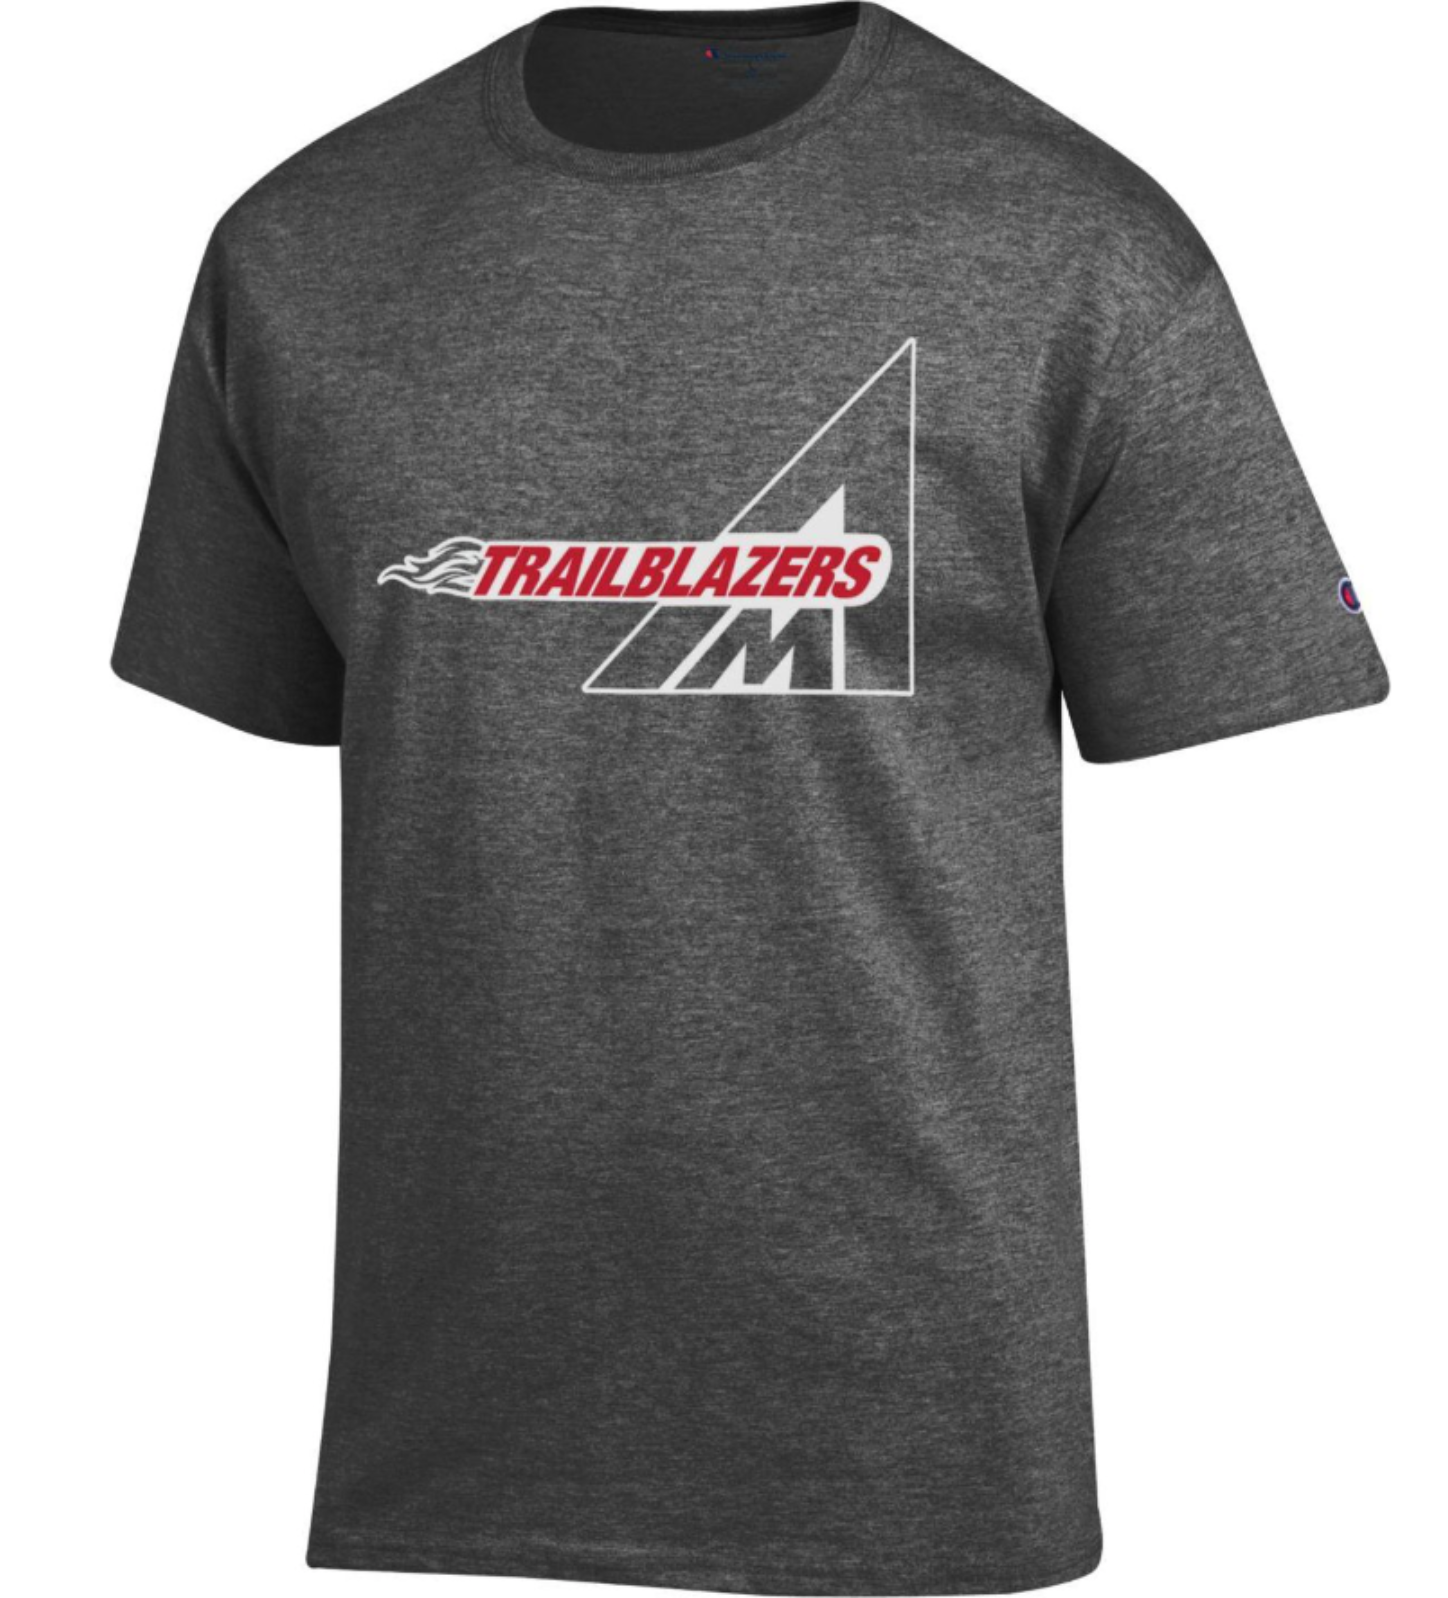 AM Trailblazers Short Sleeve T-Shirt